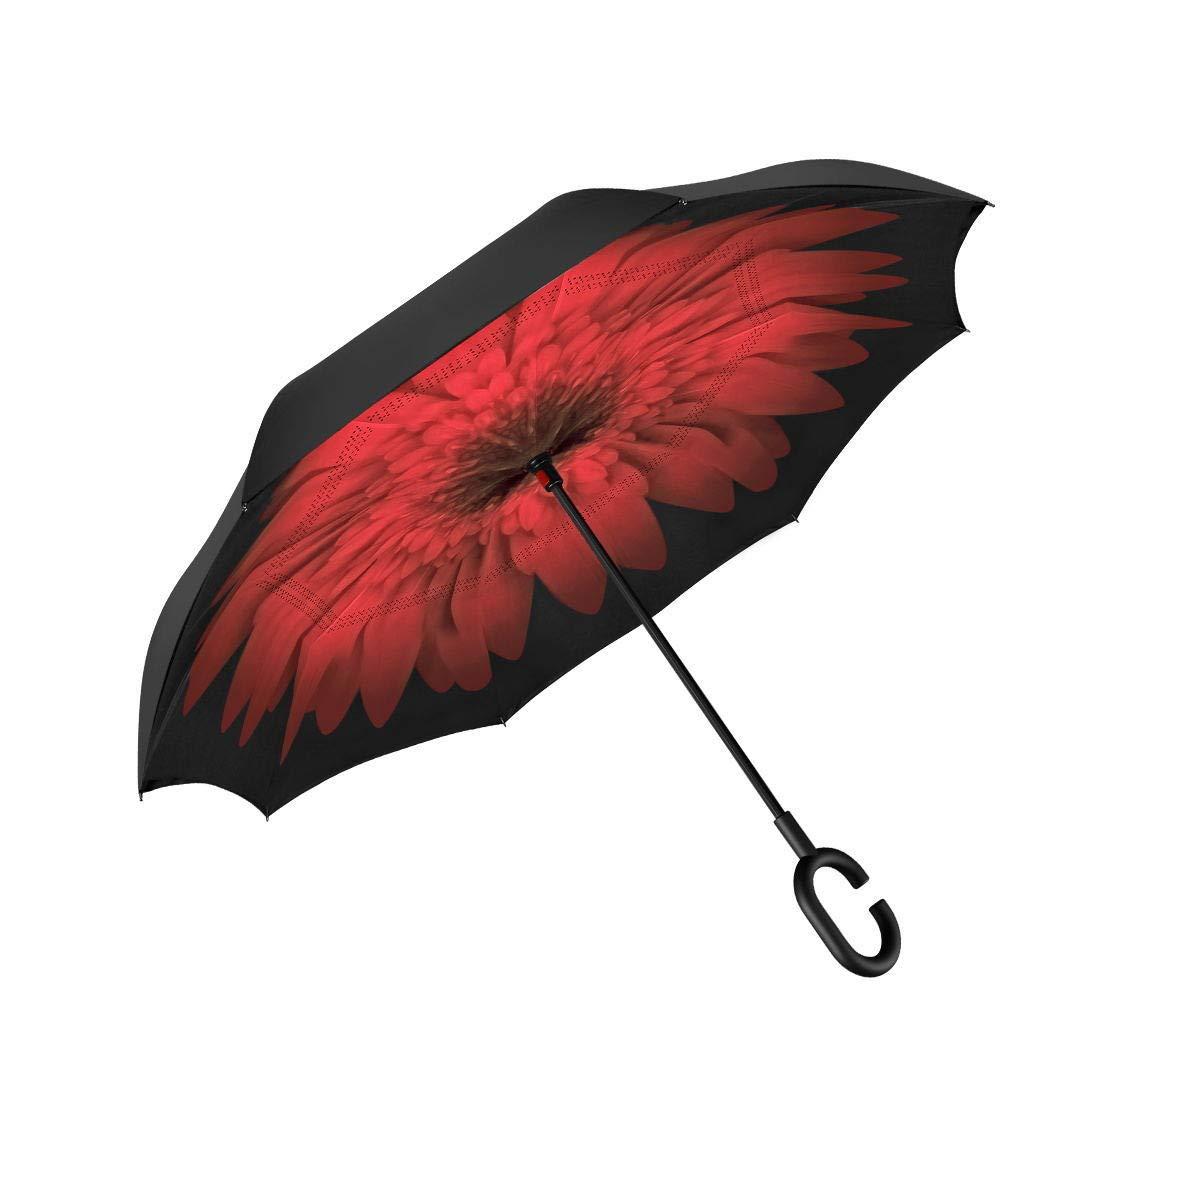 JNH サンシャイン 反転傘 二層 防風 逆折りたたみ傘 車やアウトドア用 防水 UV保護 大きなストレート傘 C型ハンドル 雨傘なし 女性や男性へのギフトに  Red Daisy B075DCW7Y8